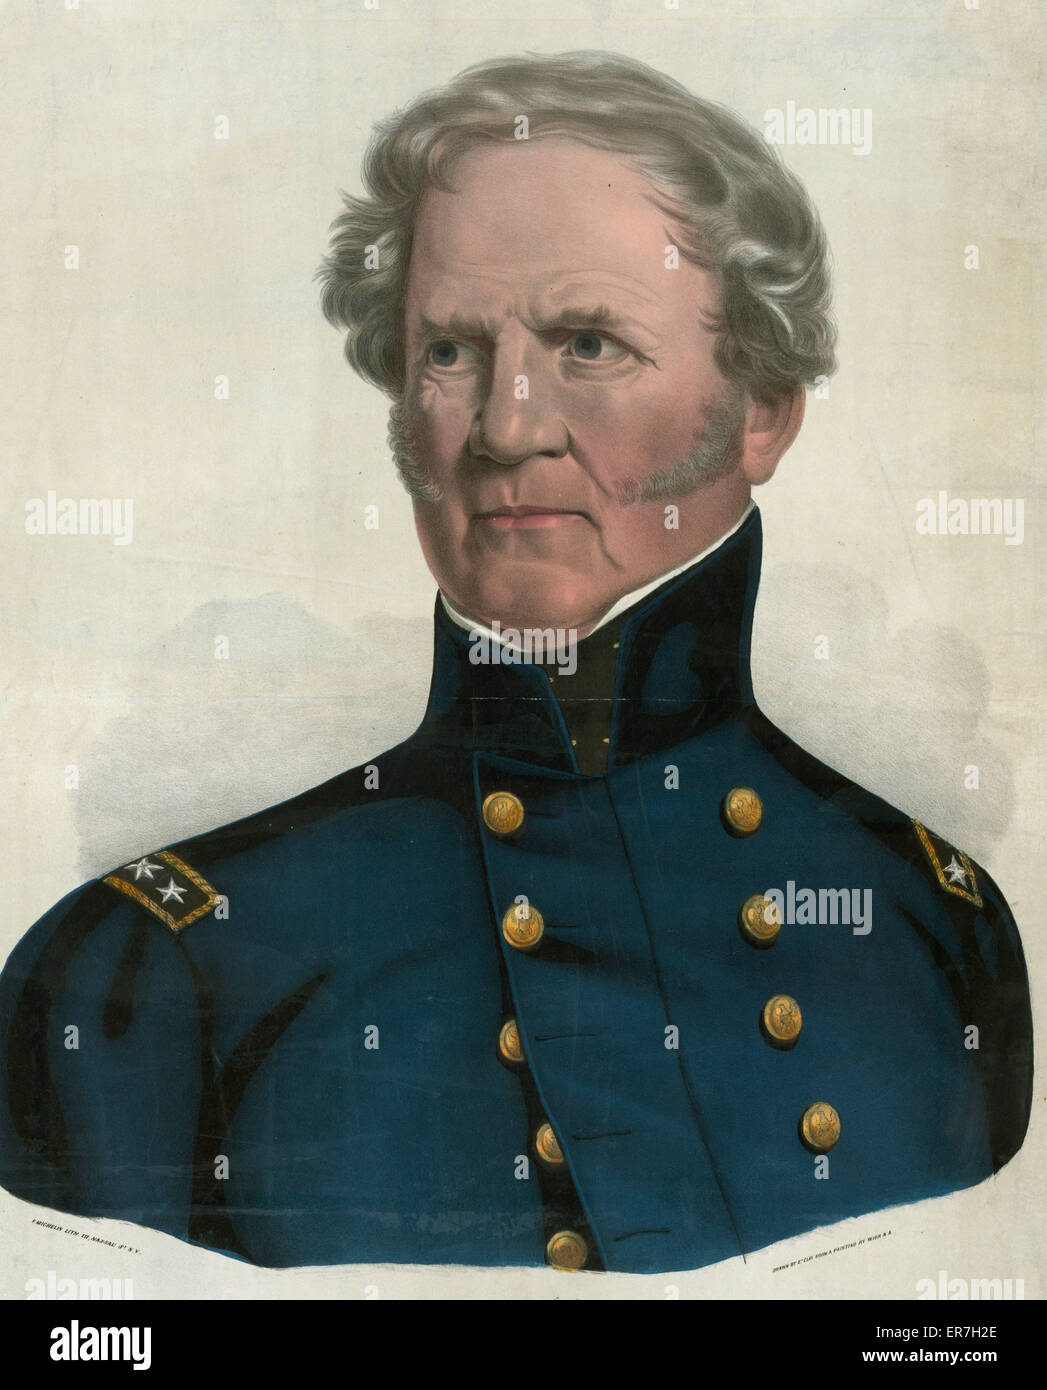 Winfield Scott, Major Genl. of the U.S. Army. Date c1847 June 26. - Stock Image